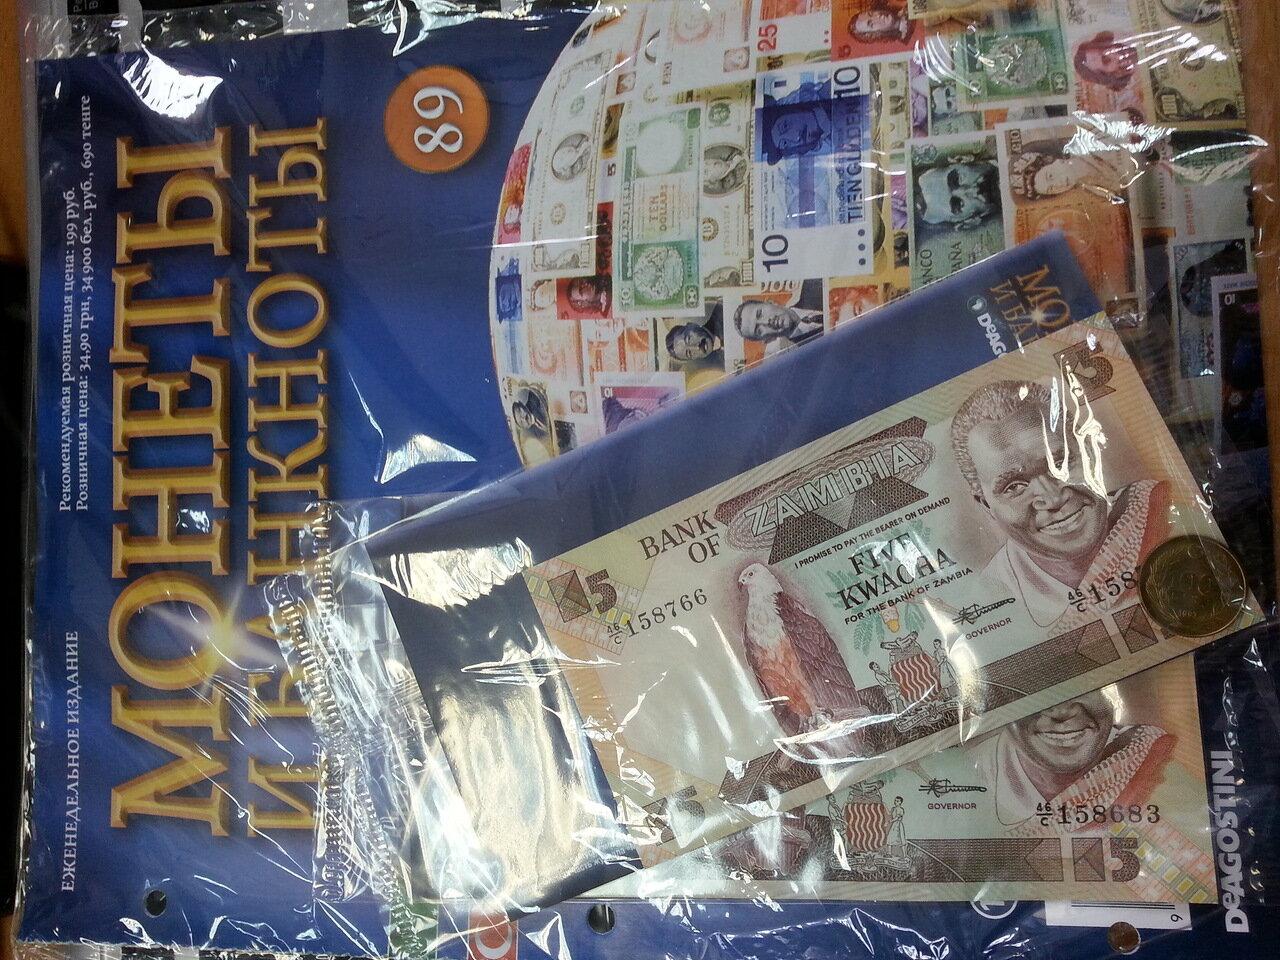 Монеты и банкноты №89 5 квач (Замбия), 100 лир (Турция)